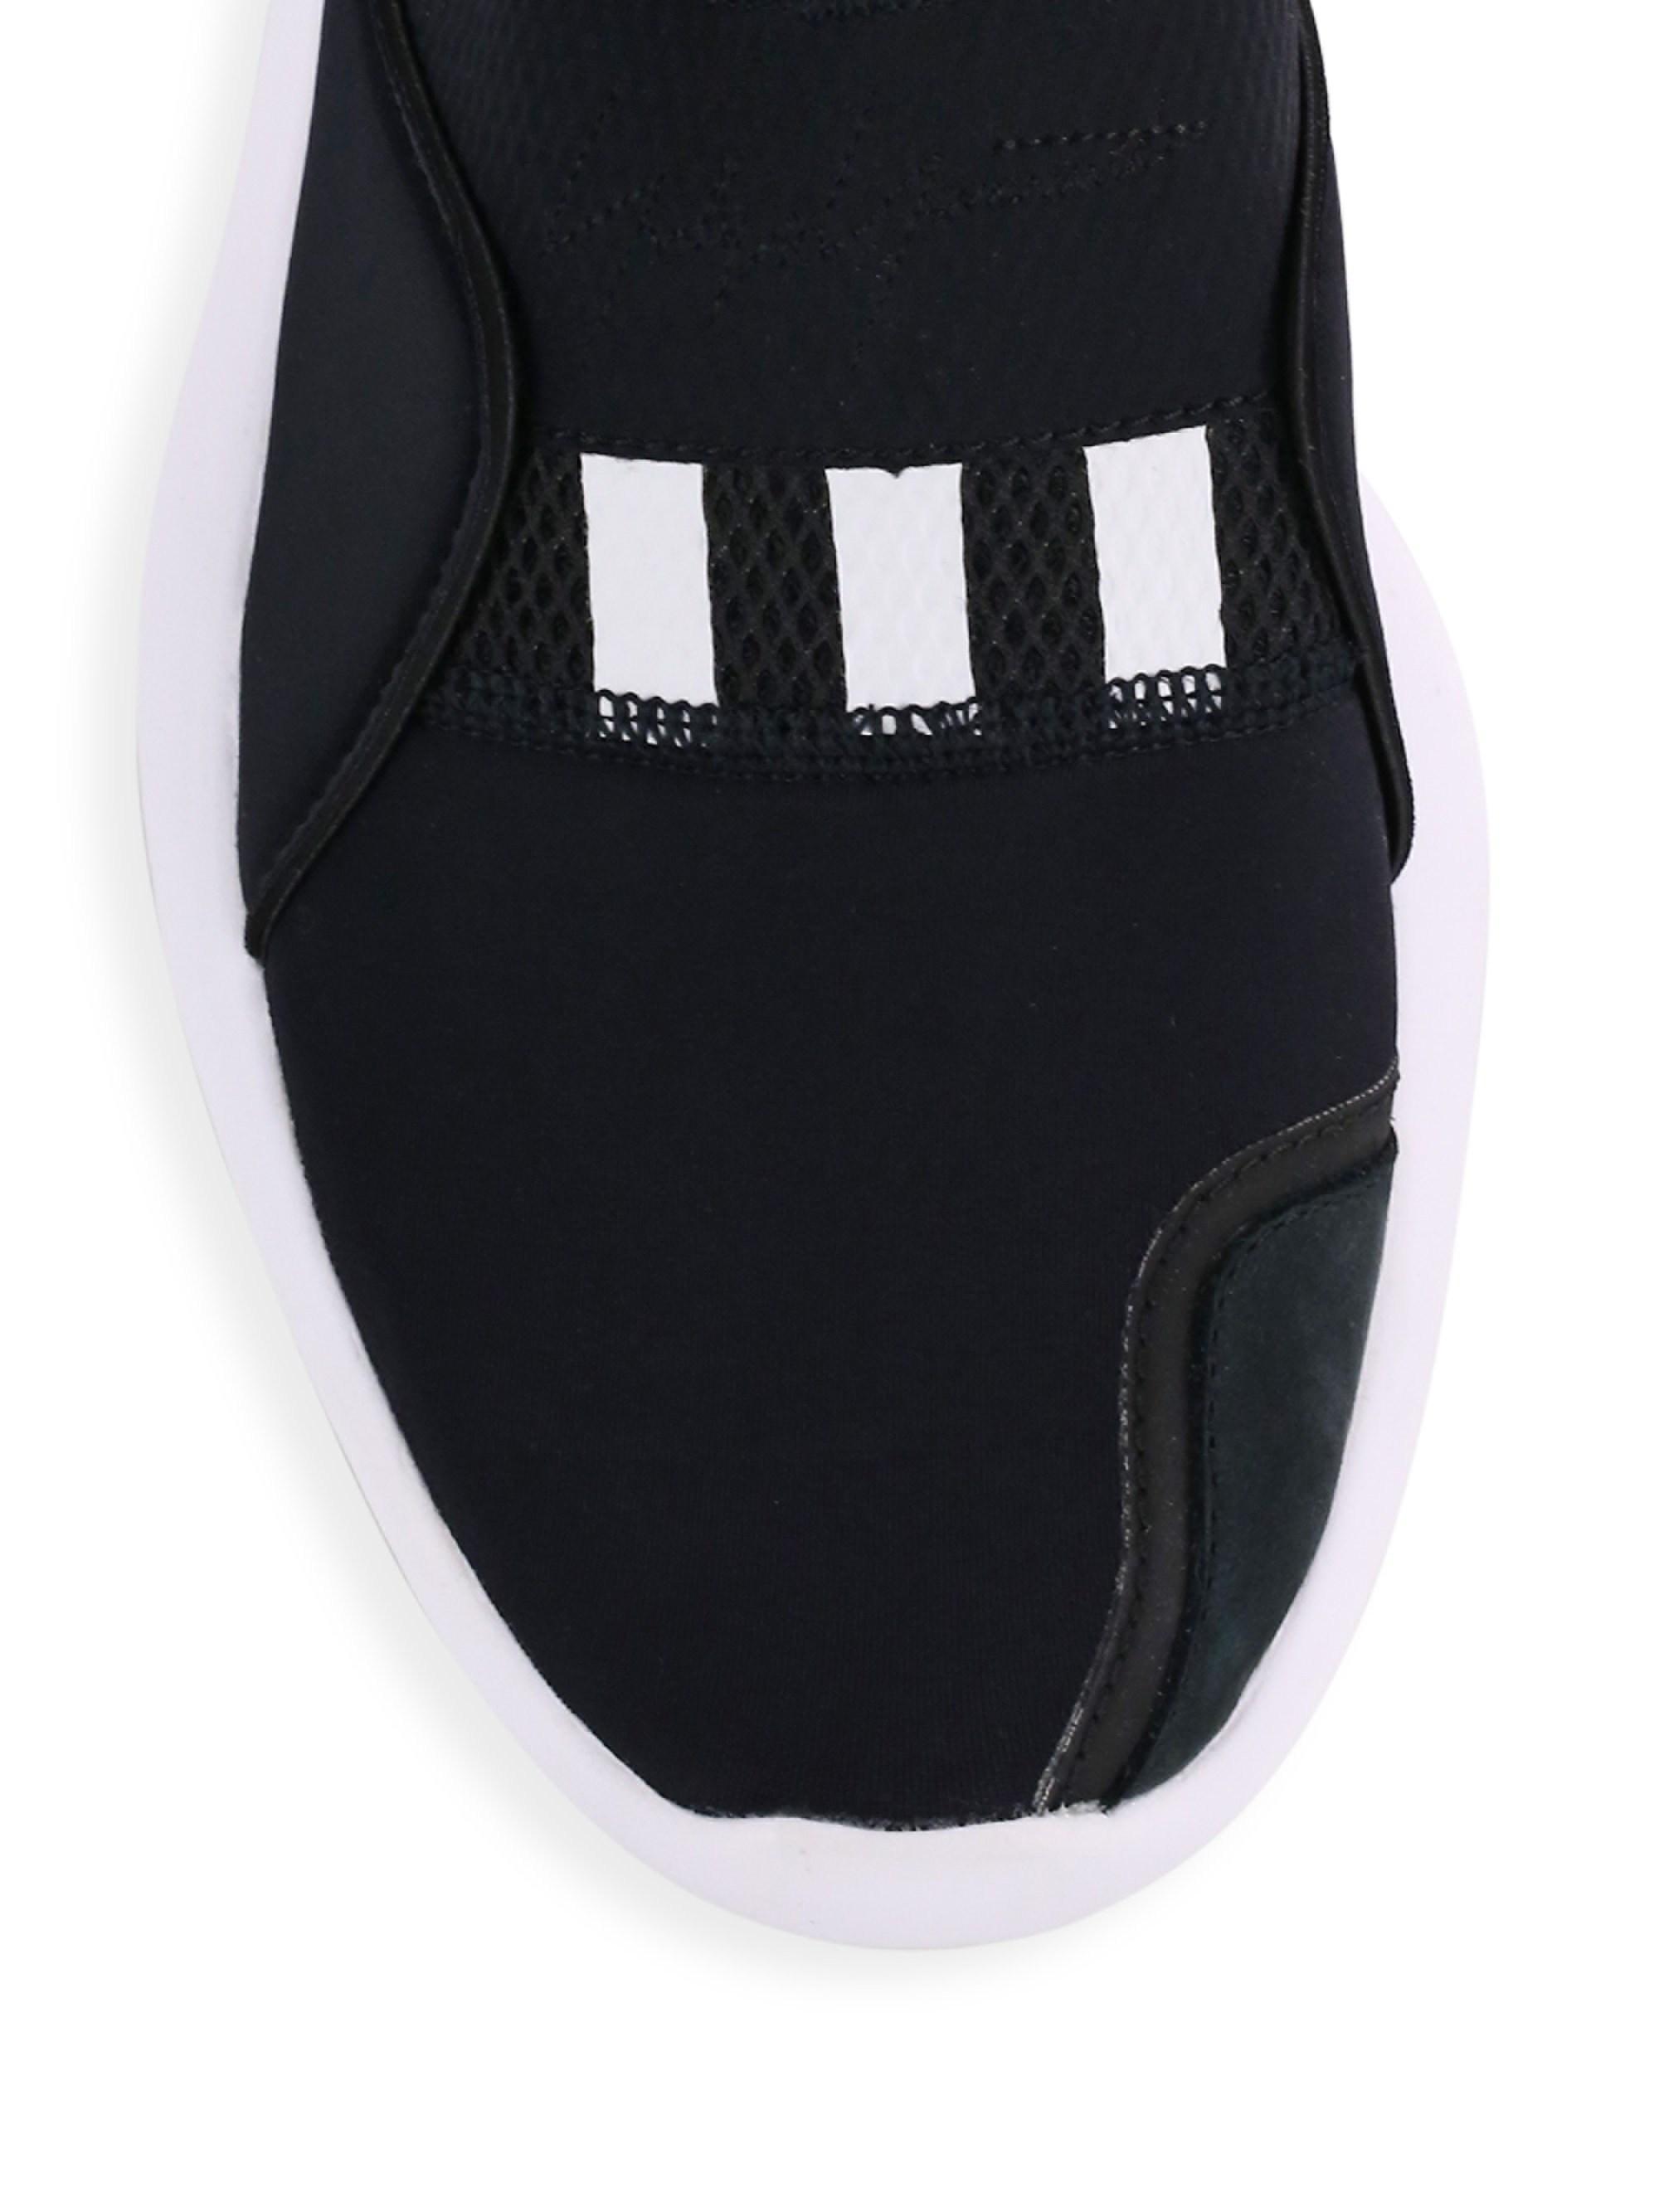 sale retailer 8ed0e e1728 Lyst - Y-3 Men s Suberou Stretch Sneakers - Black in Black for Men